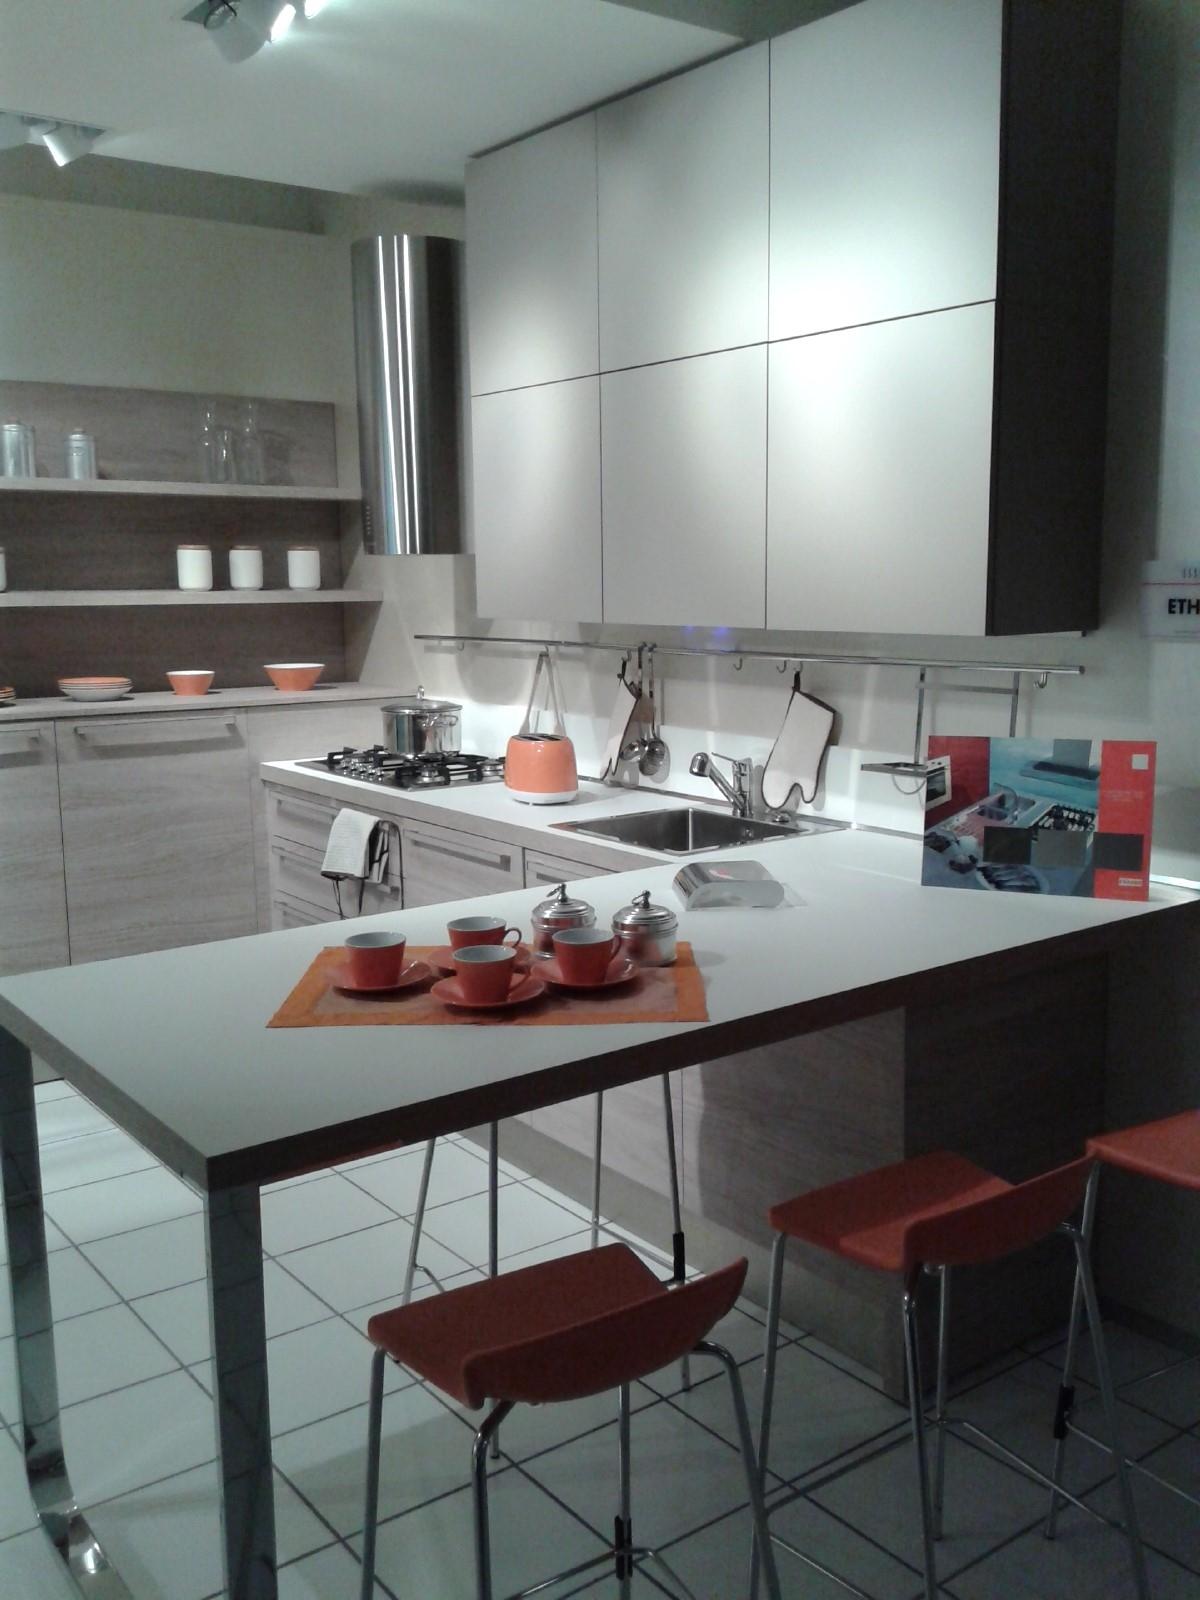 Cucina Veneta Cucine Ethica Decorativo Laminato Materico Cucine A  #8C503F 1200 1600 Rivenditori Cucine Veneta